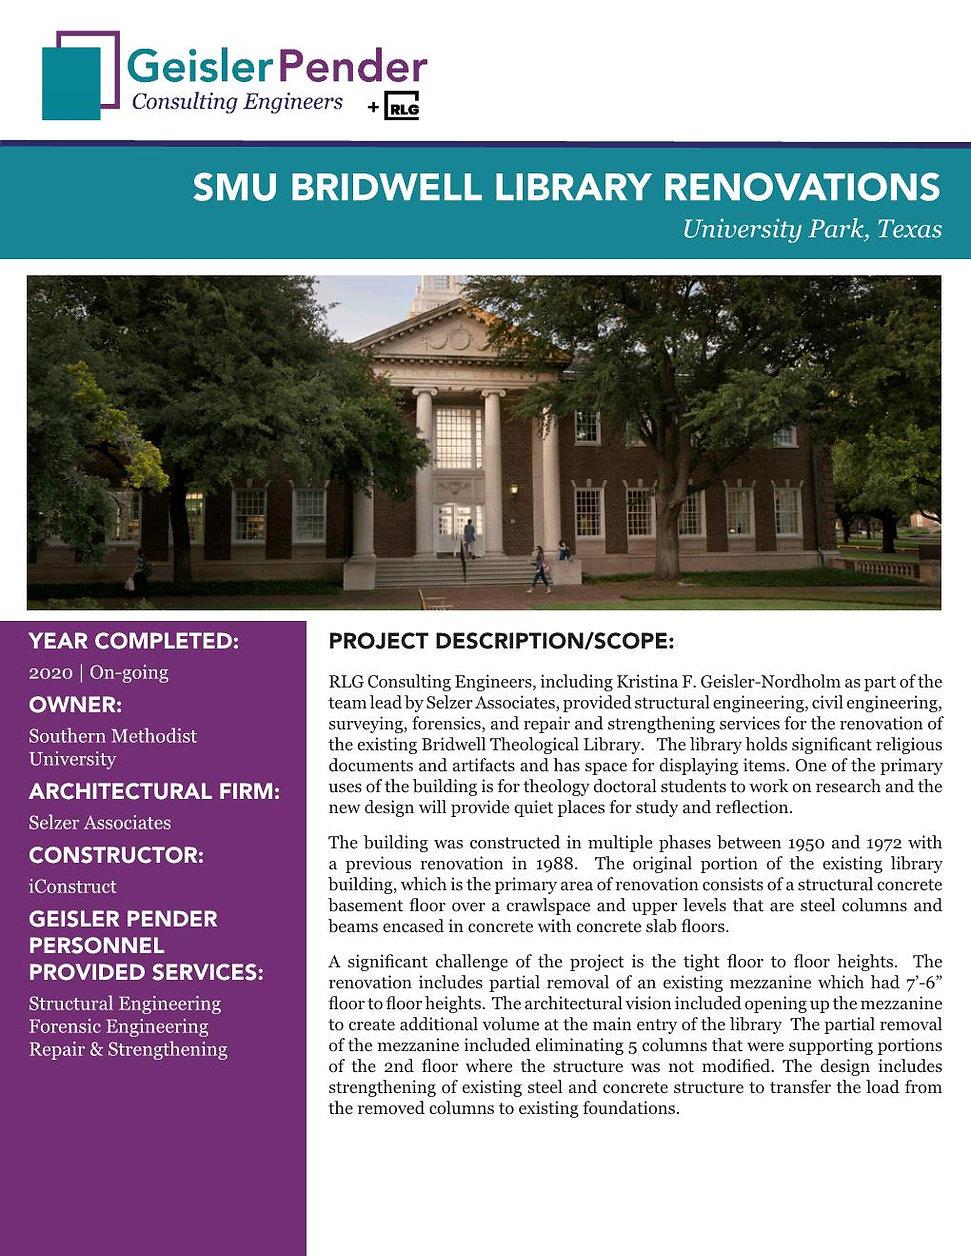 SMU Bridwell.jpg